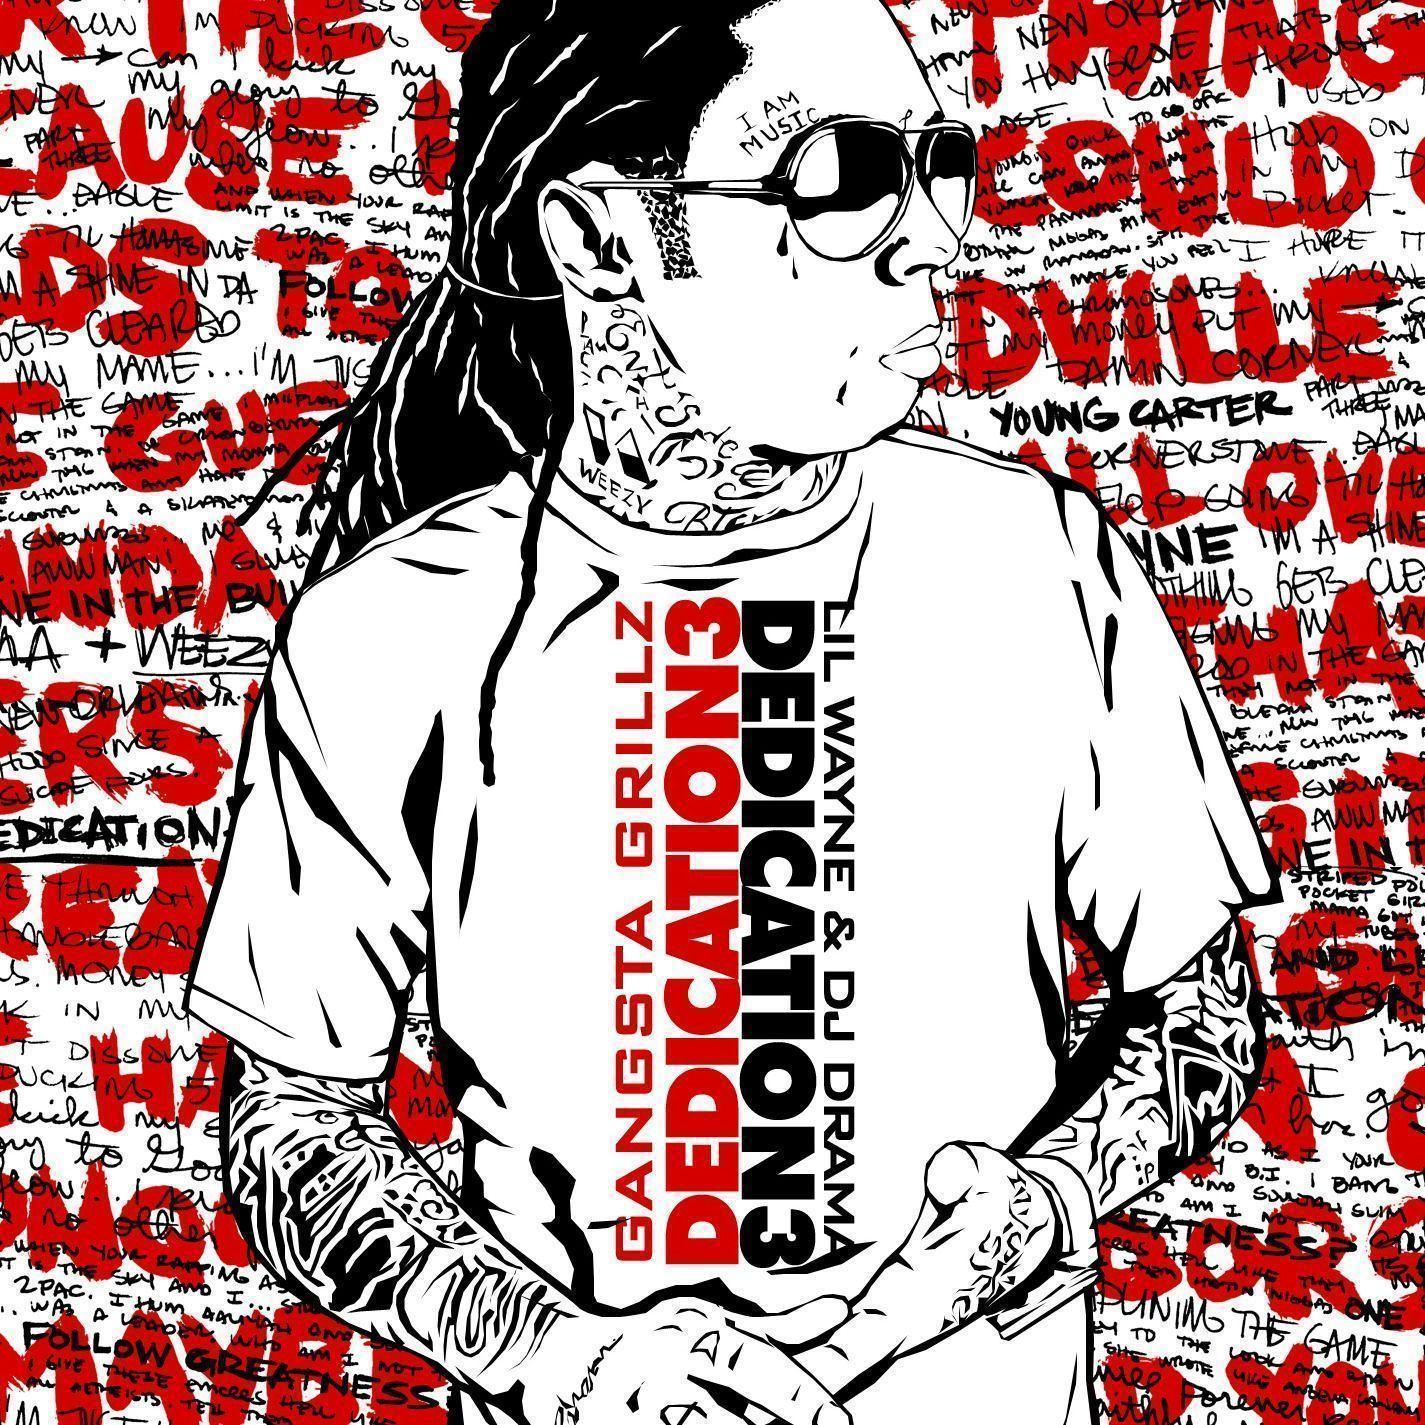 Dj Drama Lil Wayne Dedication Cover Wallpaper 1425x1425 Px Free